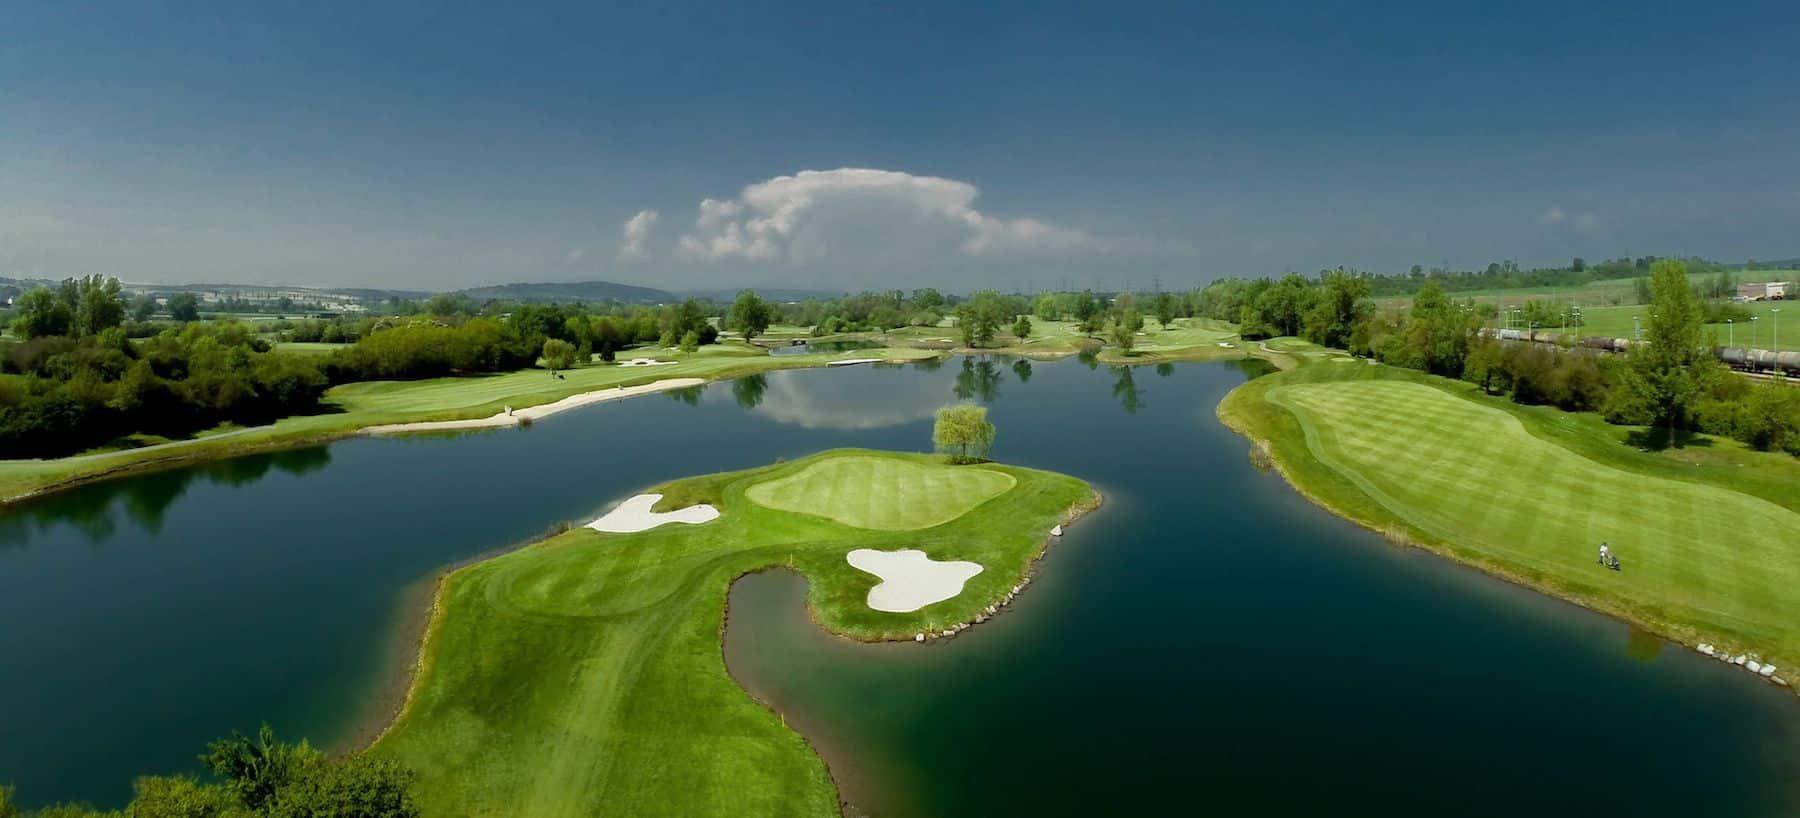 diamond-country-golf-club-6